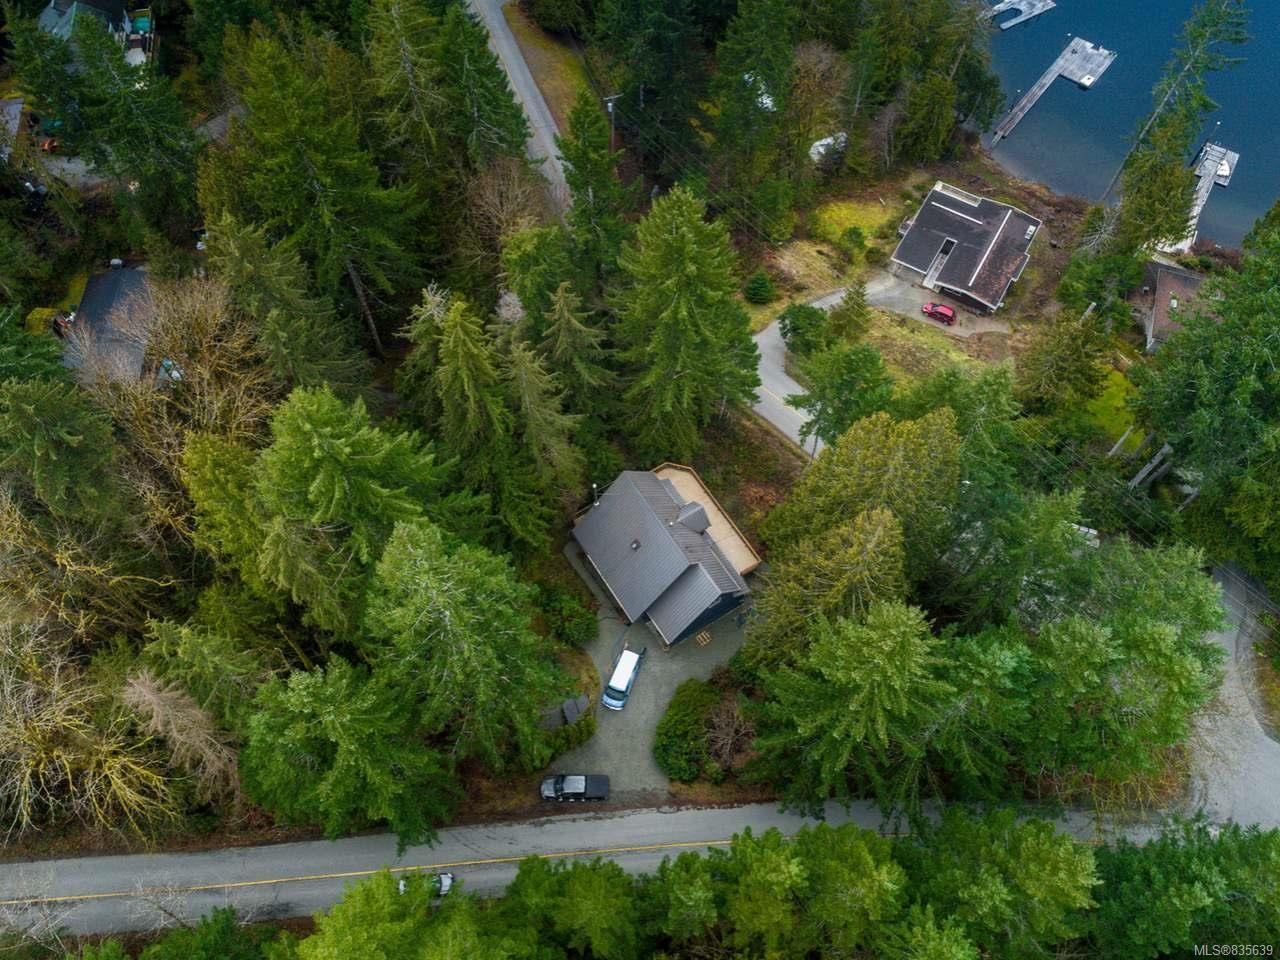 Photo 10: Photos: 9657 Faber Rd in PORT ALBERNI: PA Sproat Lake House for sale (Port Alberni)  : MLS®# 835639